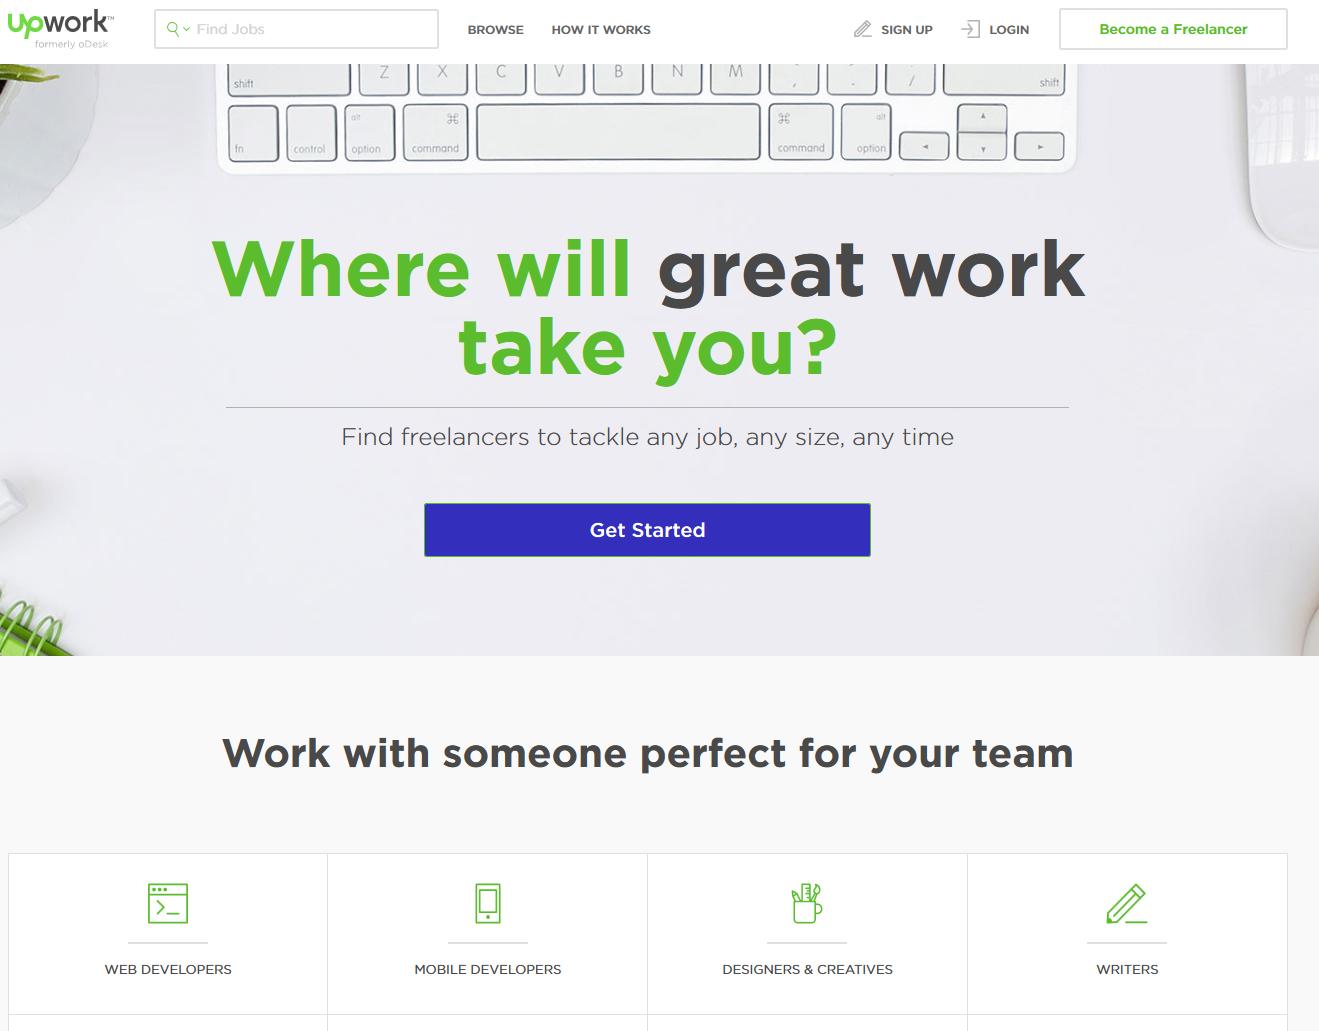 screenshot-www upwork com 2015-07-13 19-22-00.png